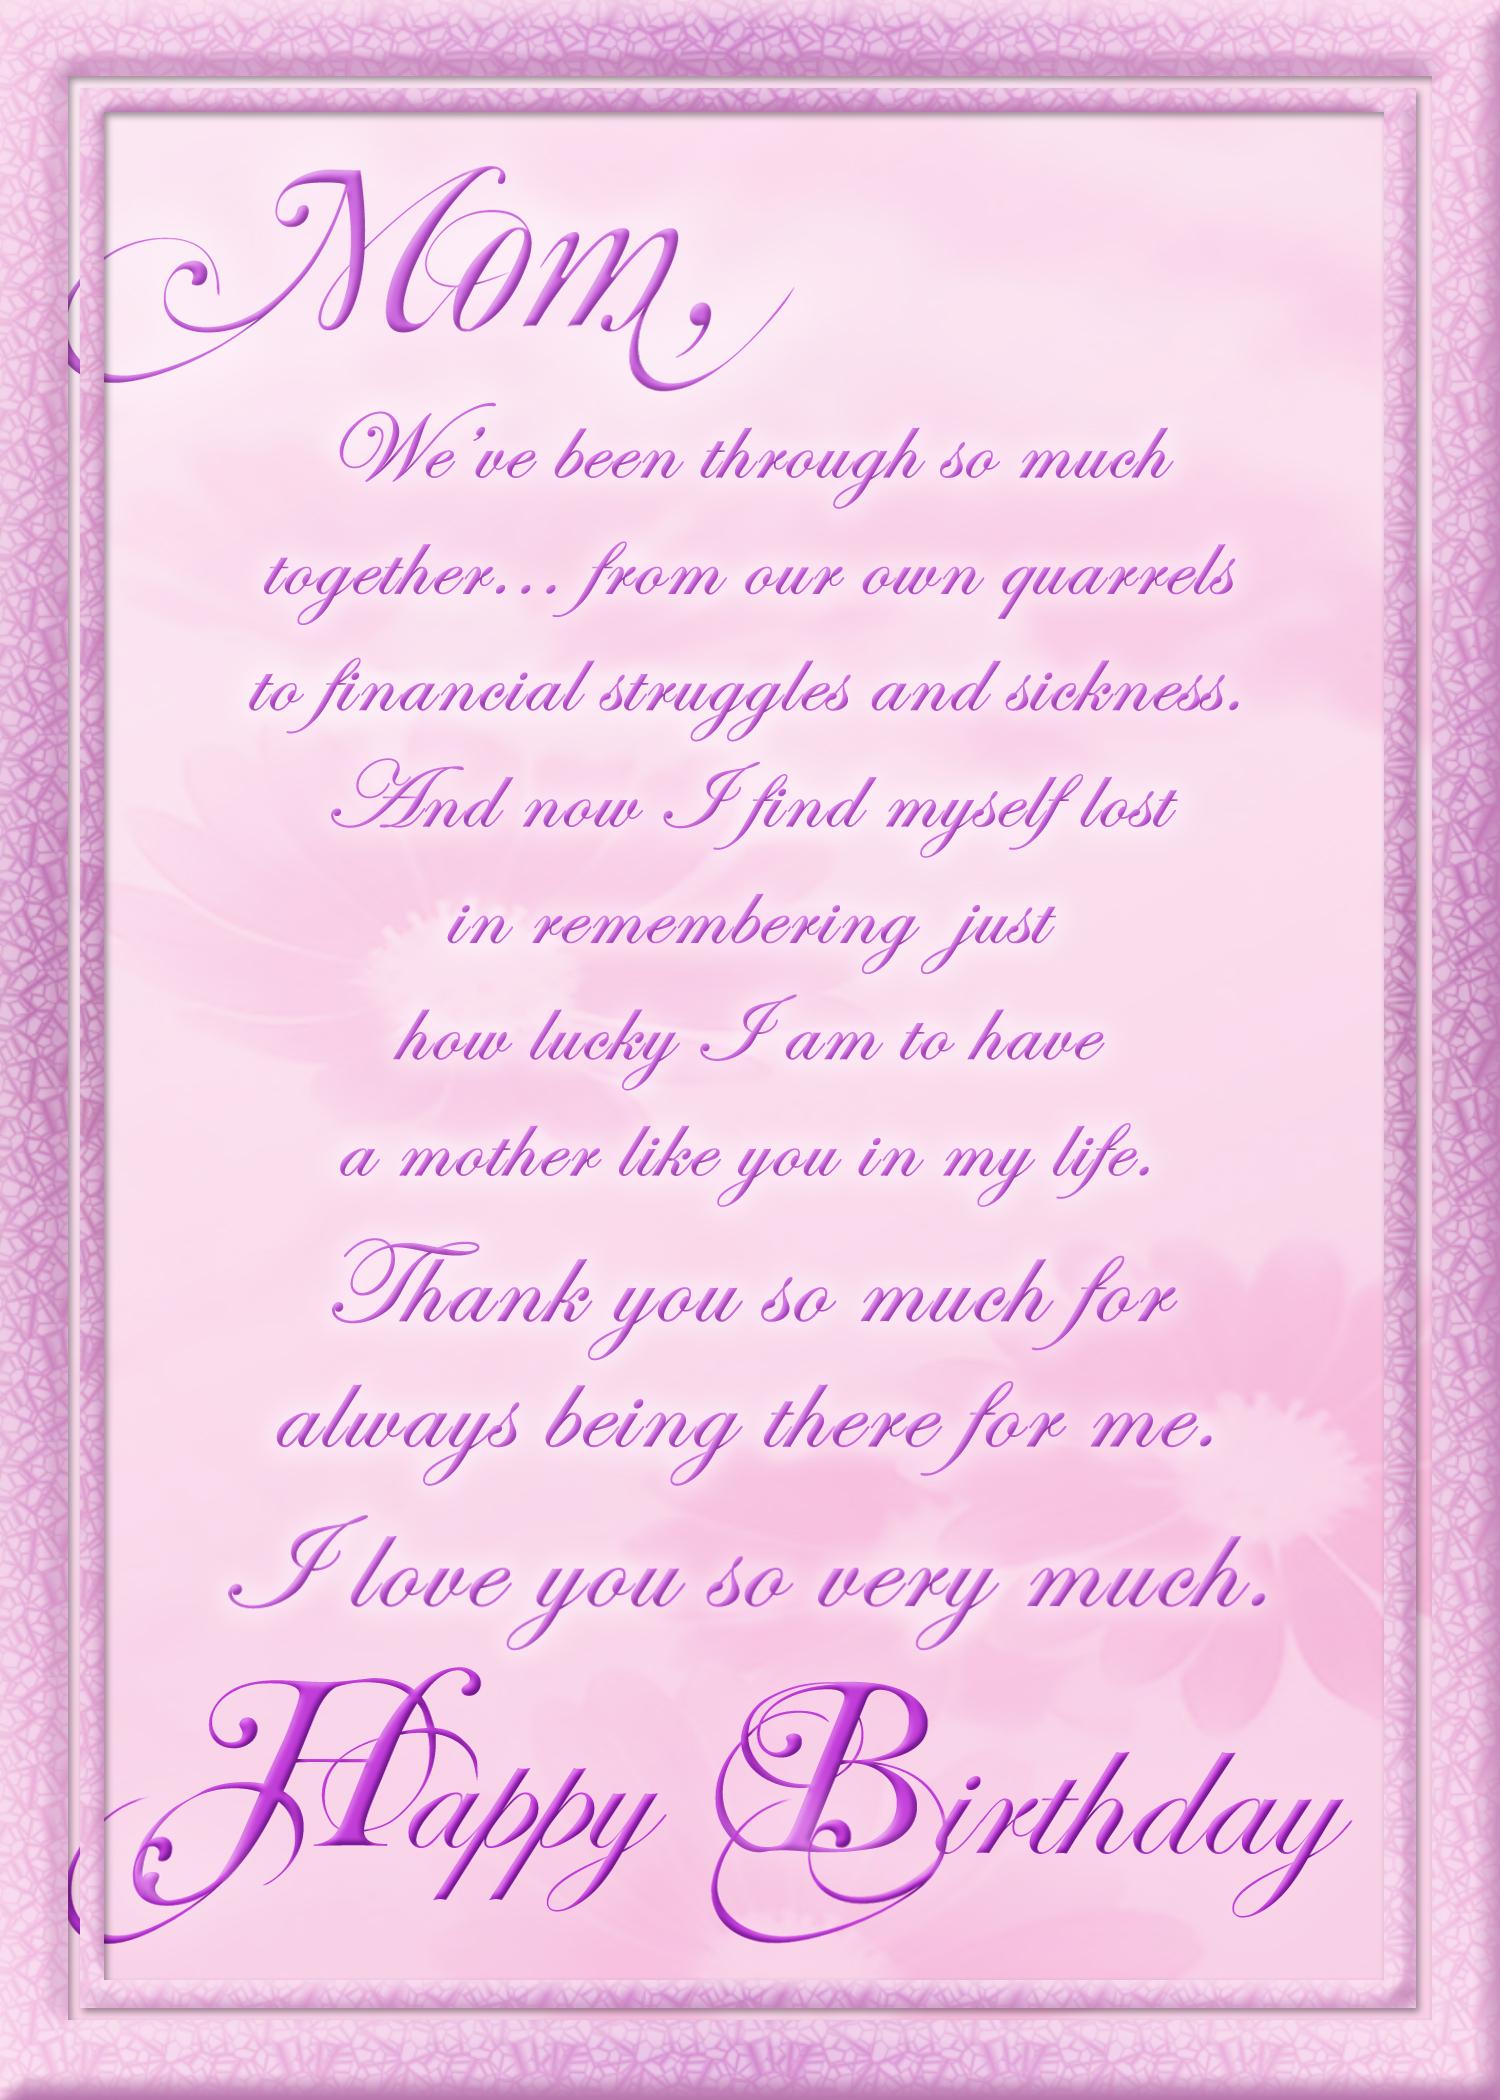 Birthday Card For Mom By Jteddy71 On Deviantart